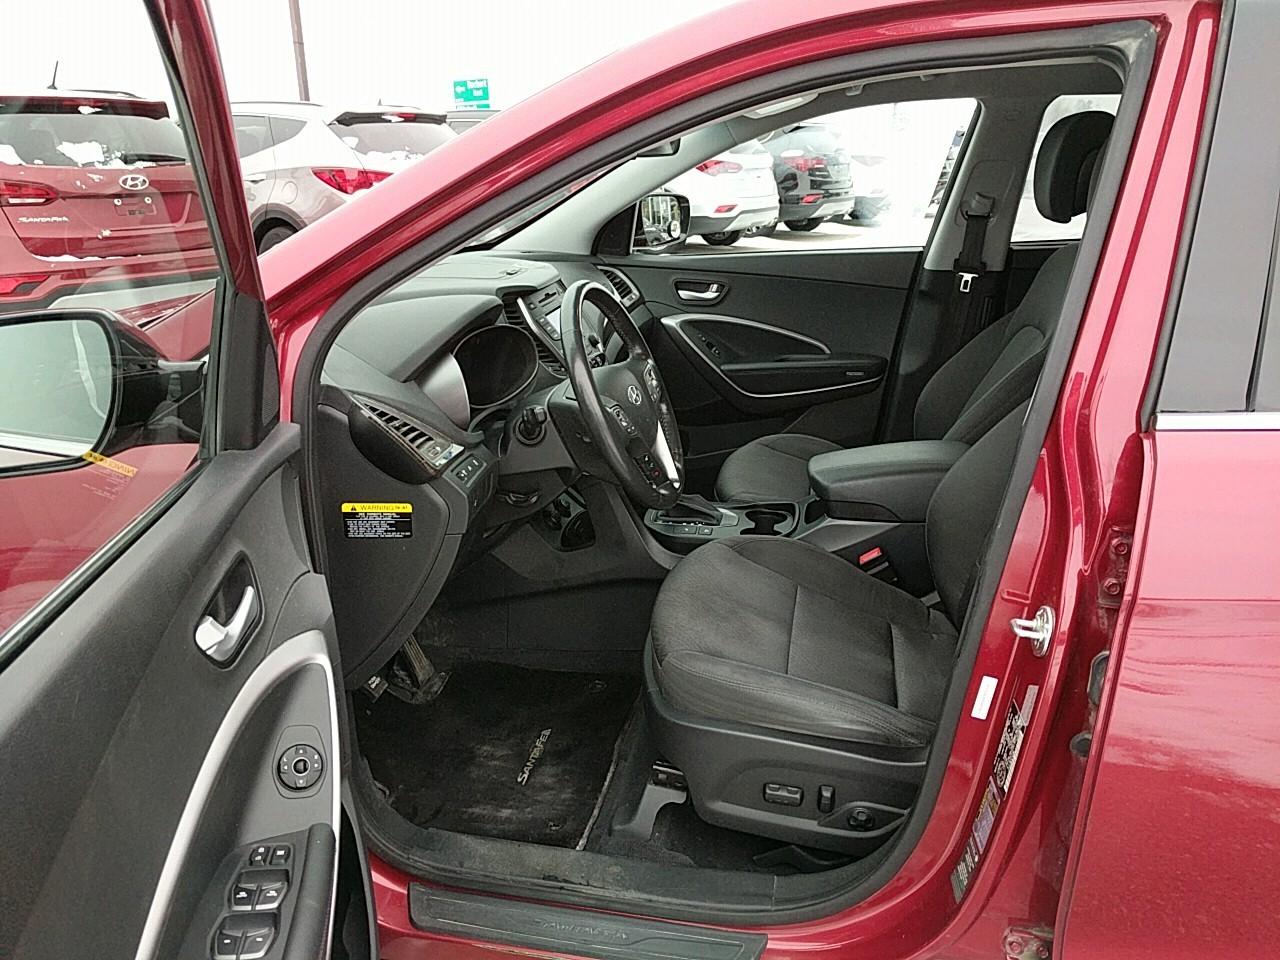 2015 Hyundai Santa Fe Sport 2.4 Premium (Stk: 80043A) in Goderich - Image 7 of 12